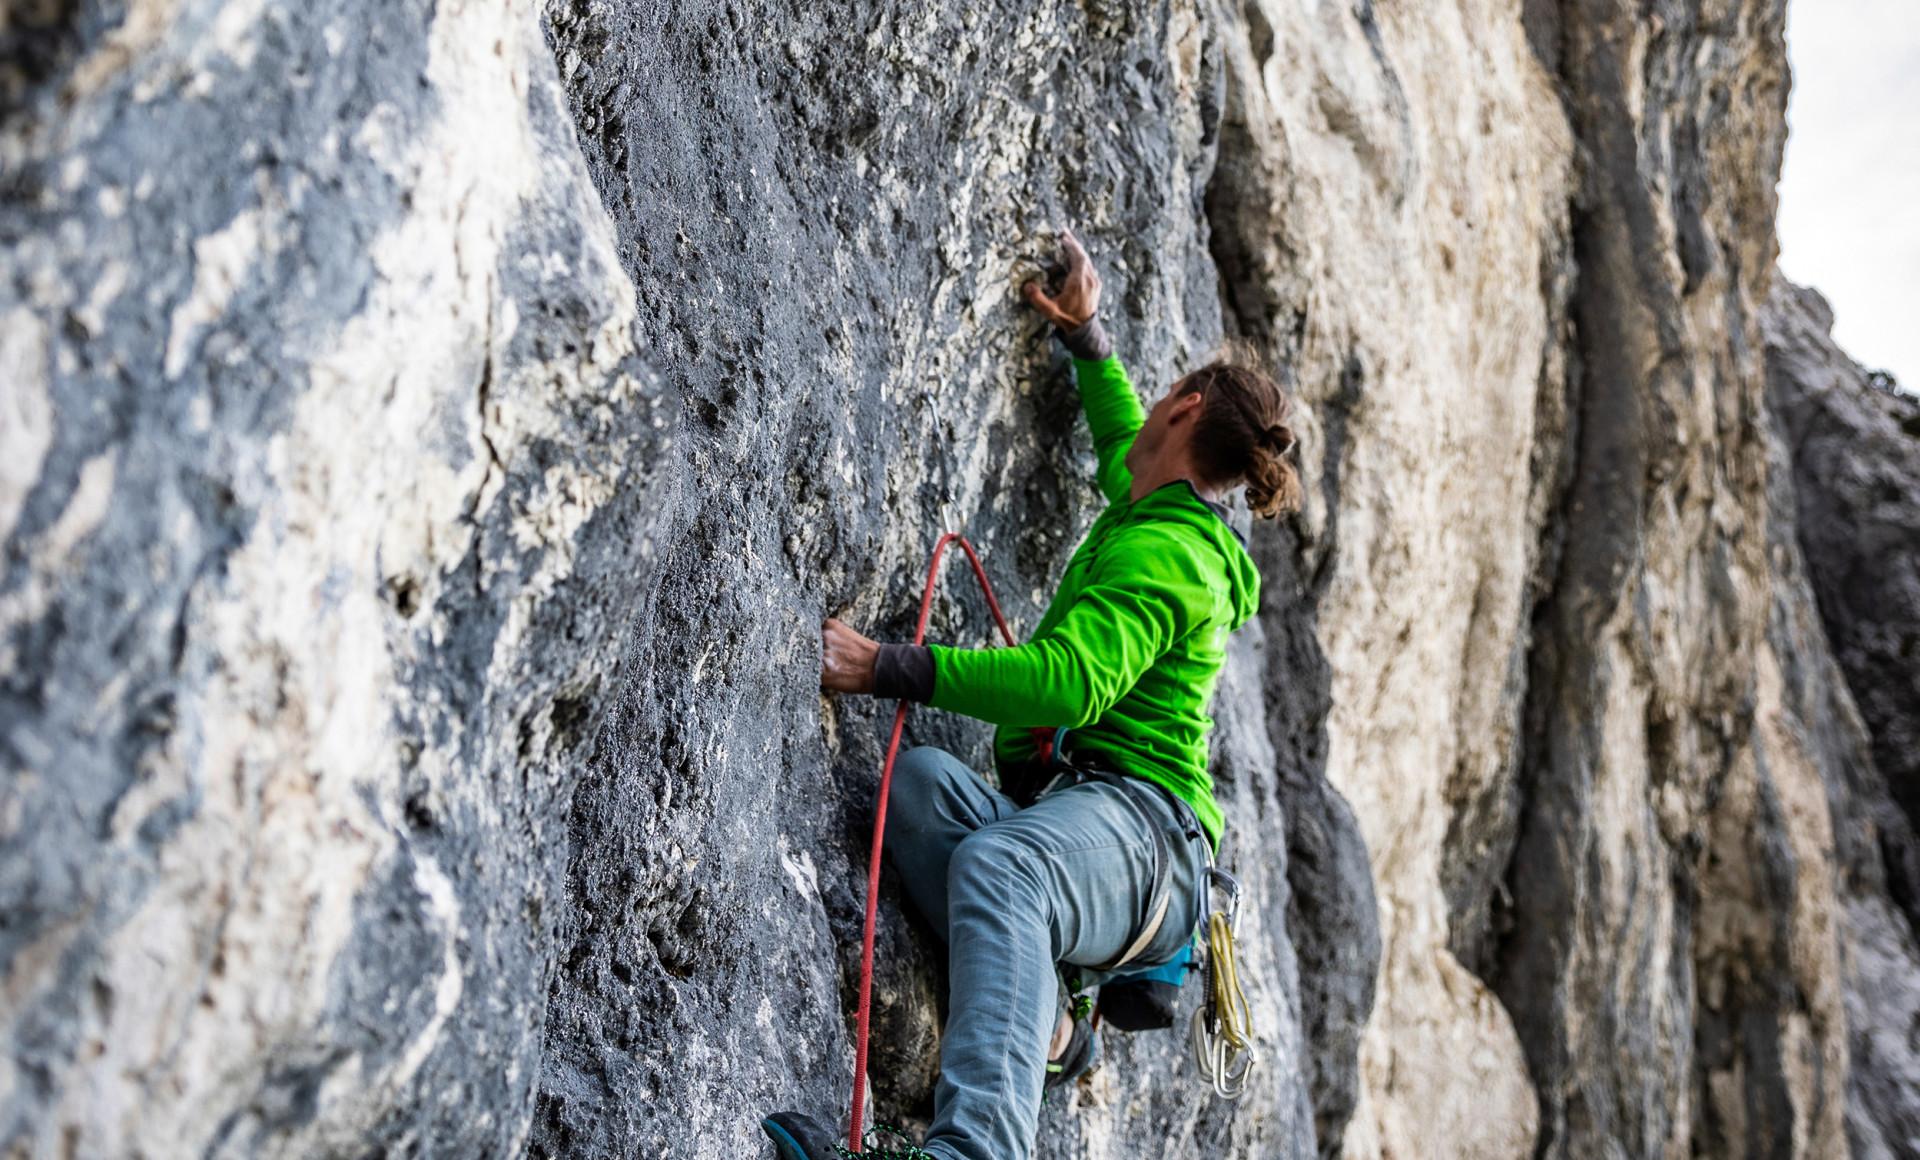 Gietl Kaiser Klettern Lowa Athleten Meeting Papert lowa